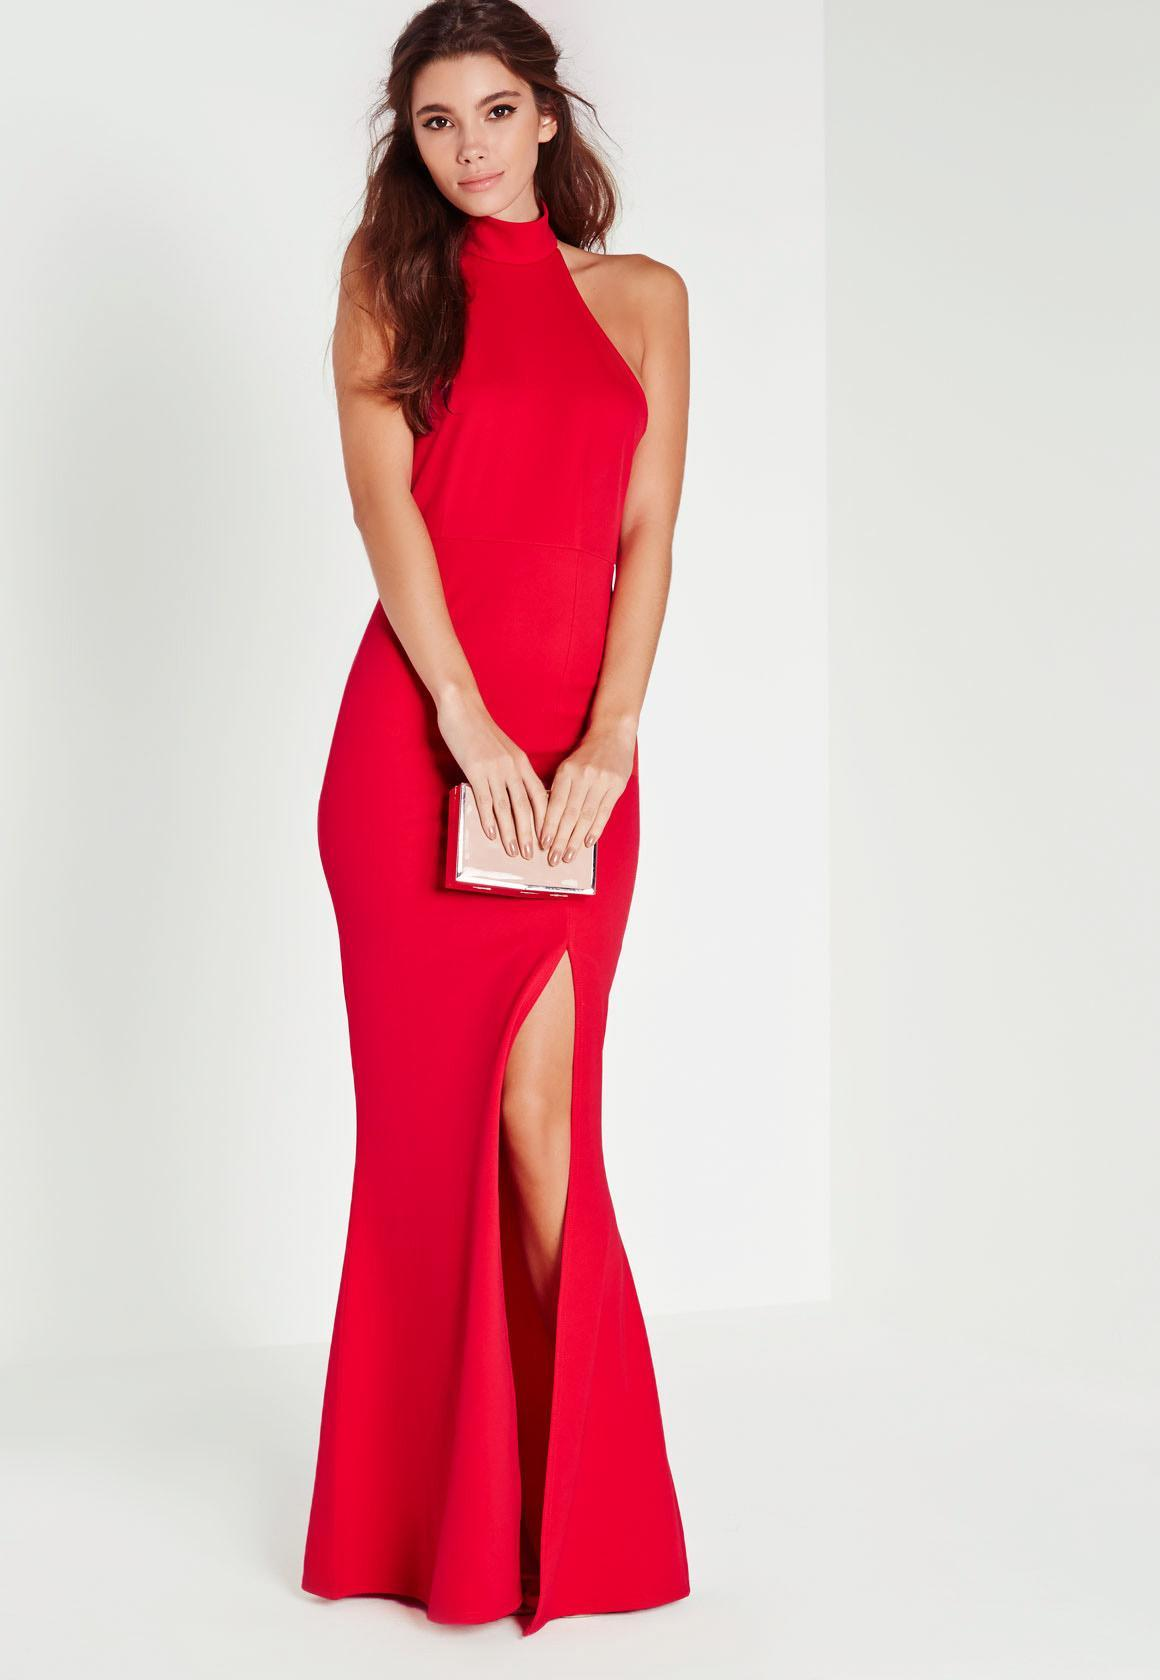 Robe rouge longue dos nu